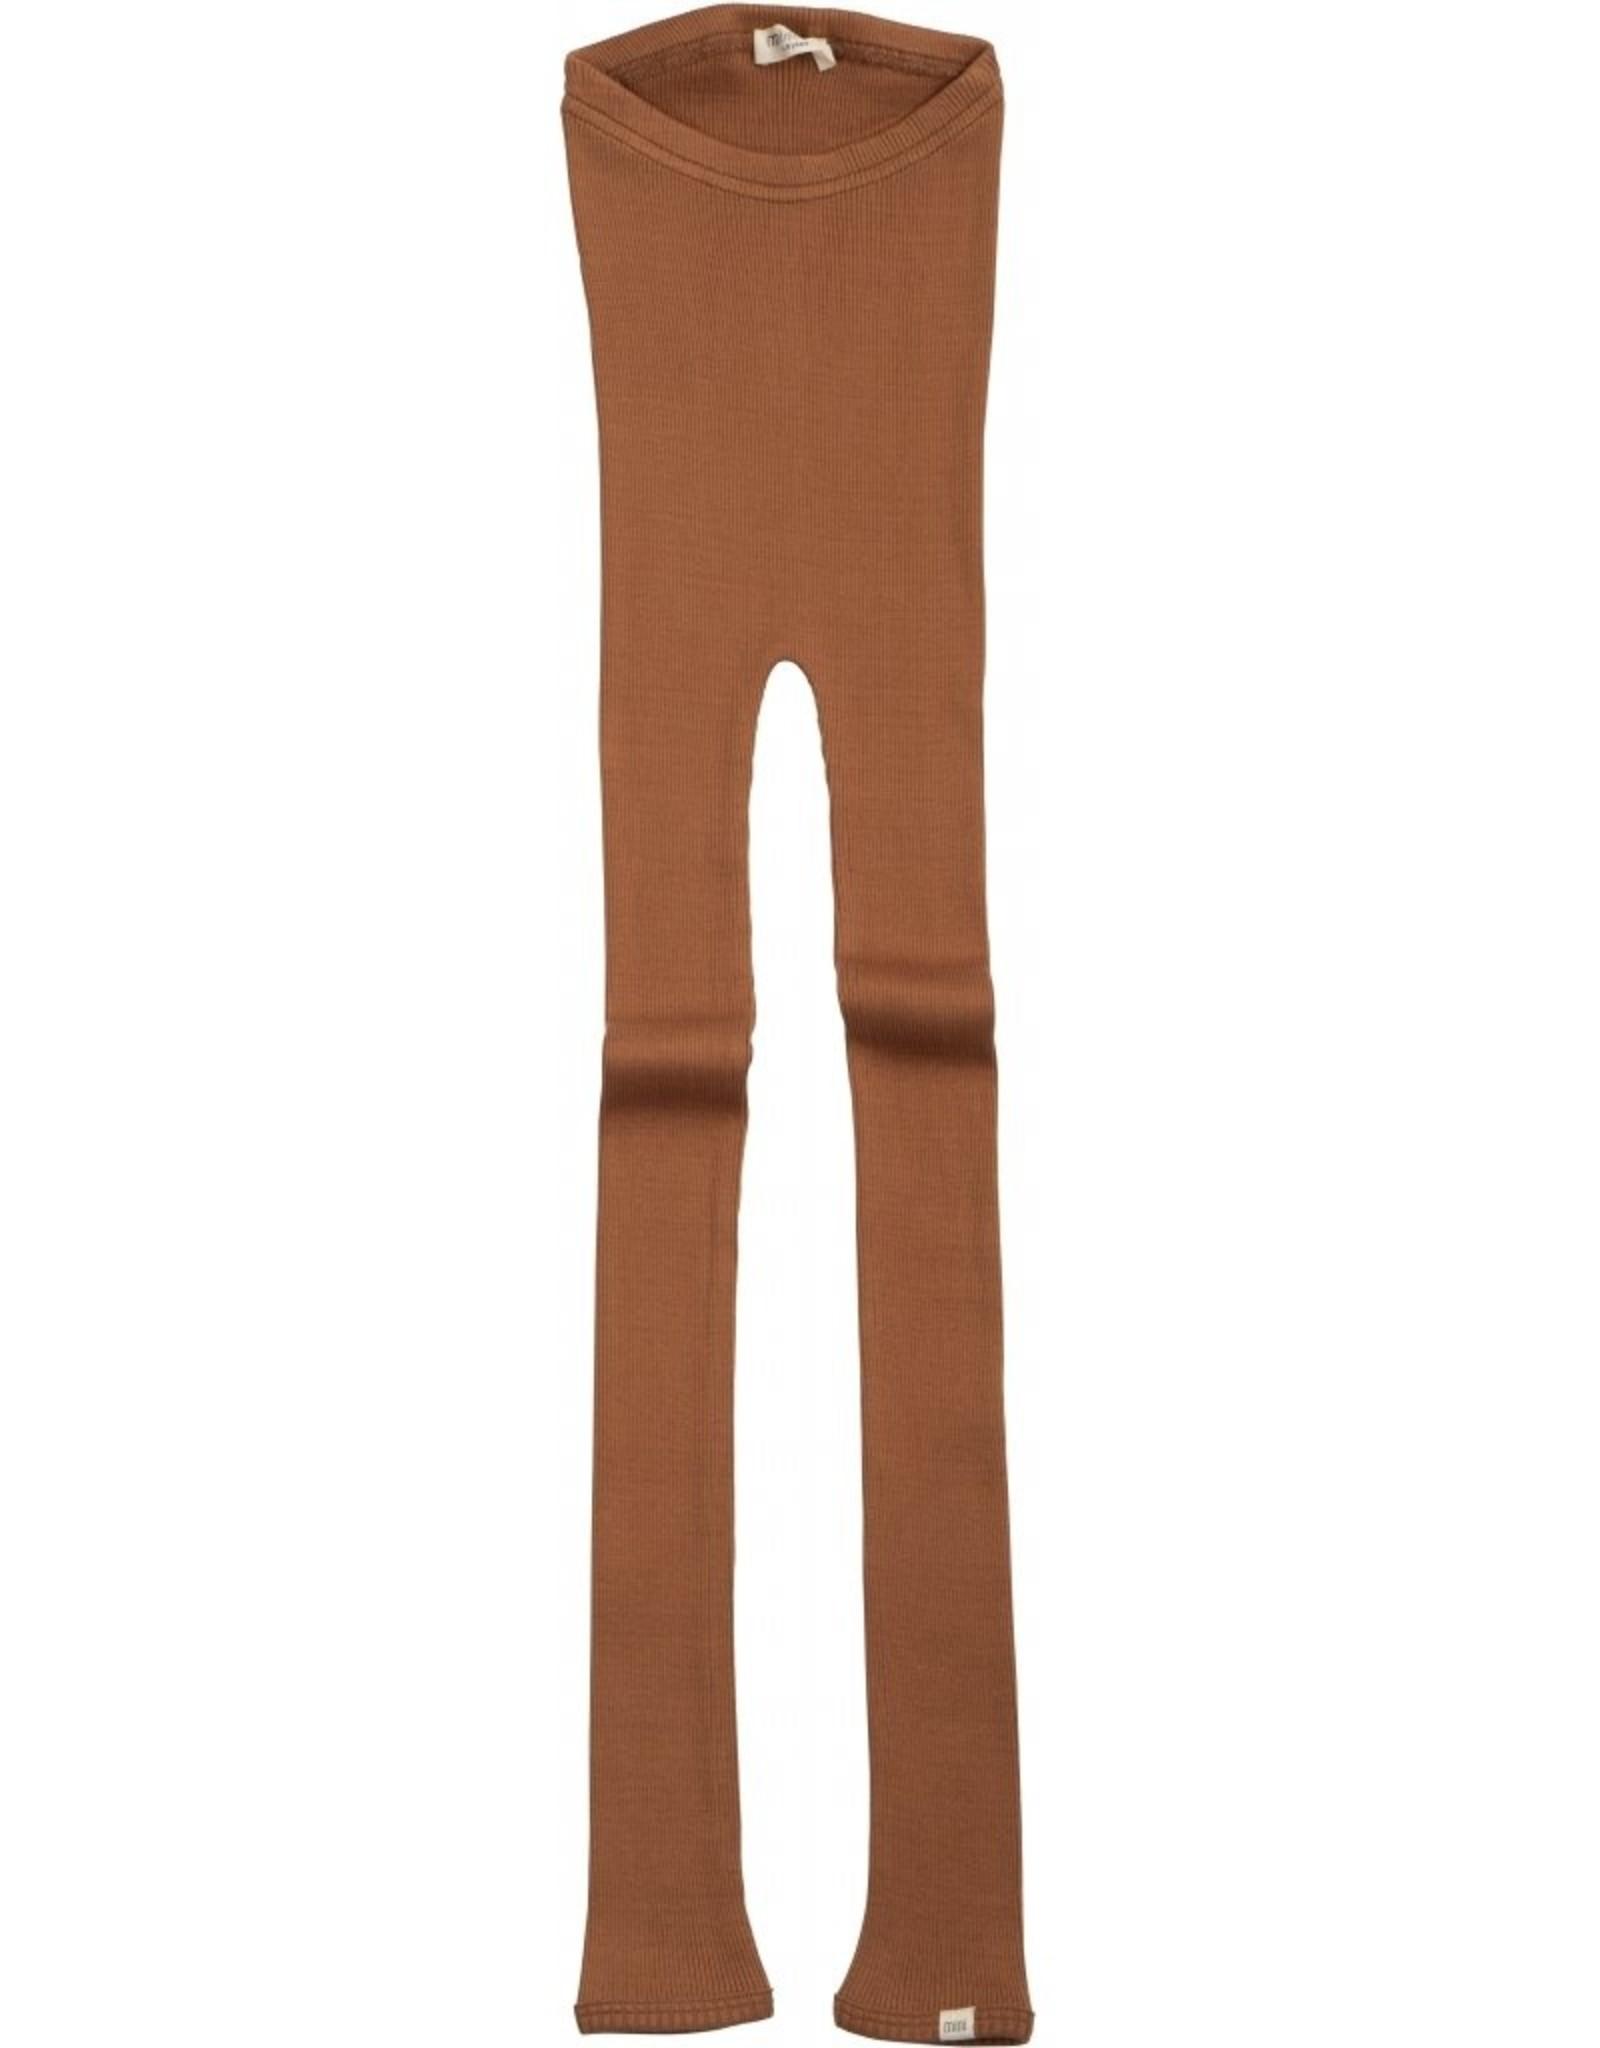 Minimalisma Bieber Leggings